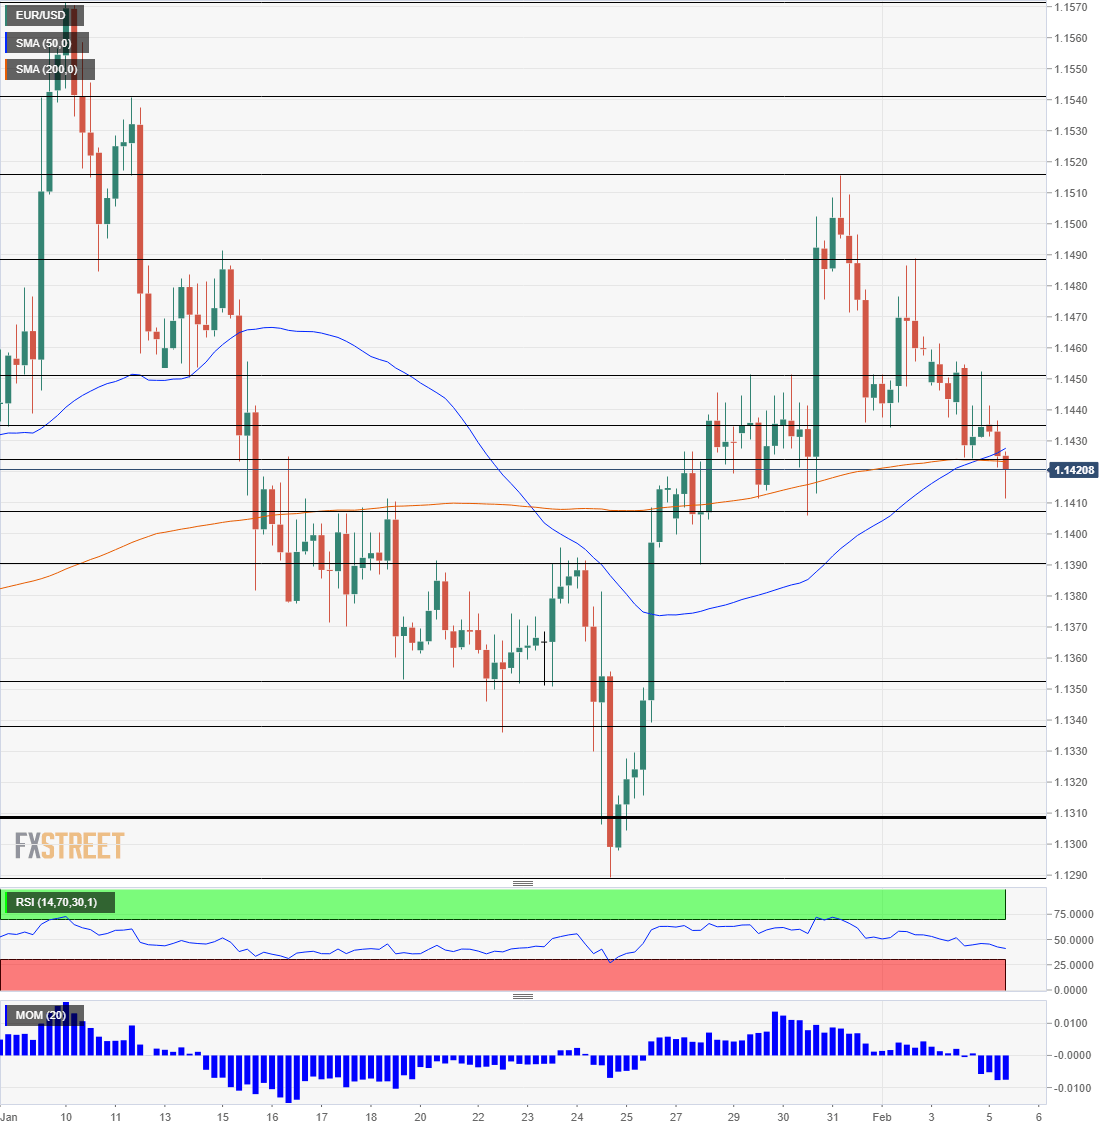 EUR USD Technical Analysis February 5 2019